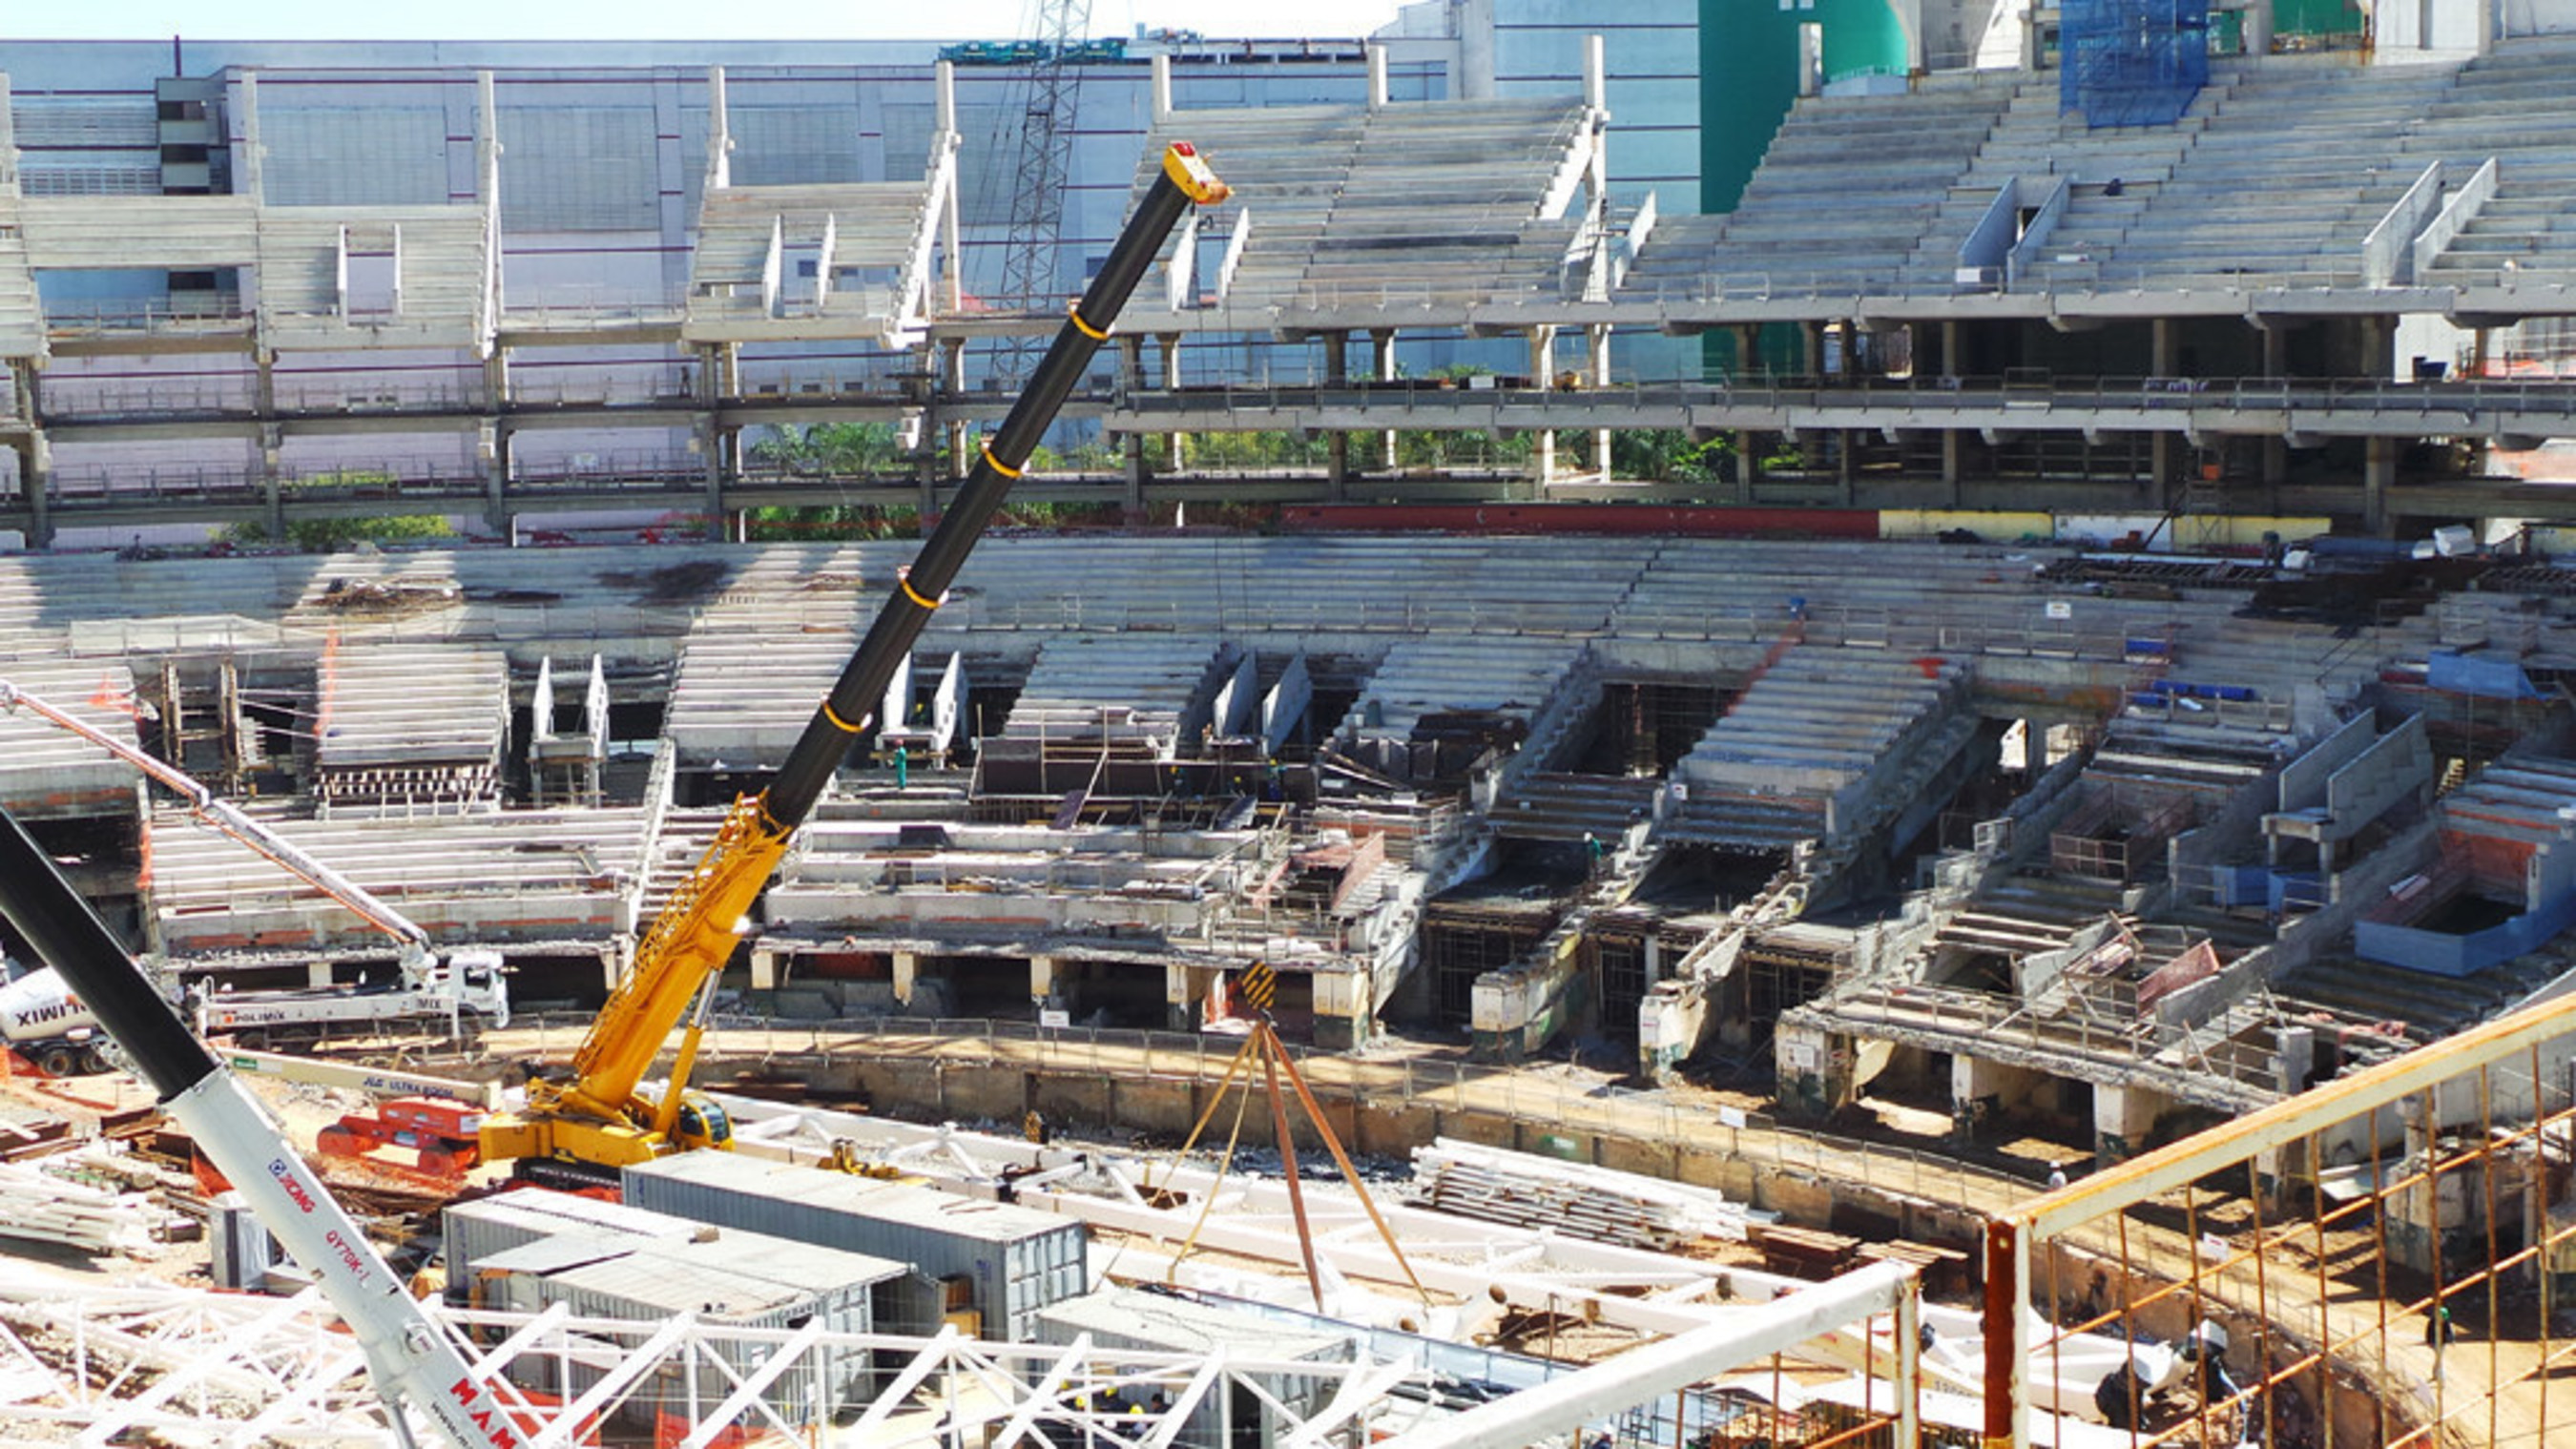 XCMG cranes working at Arena Fonte Nova, a World Cup venue in Salvador